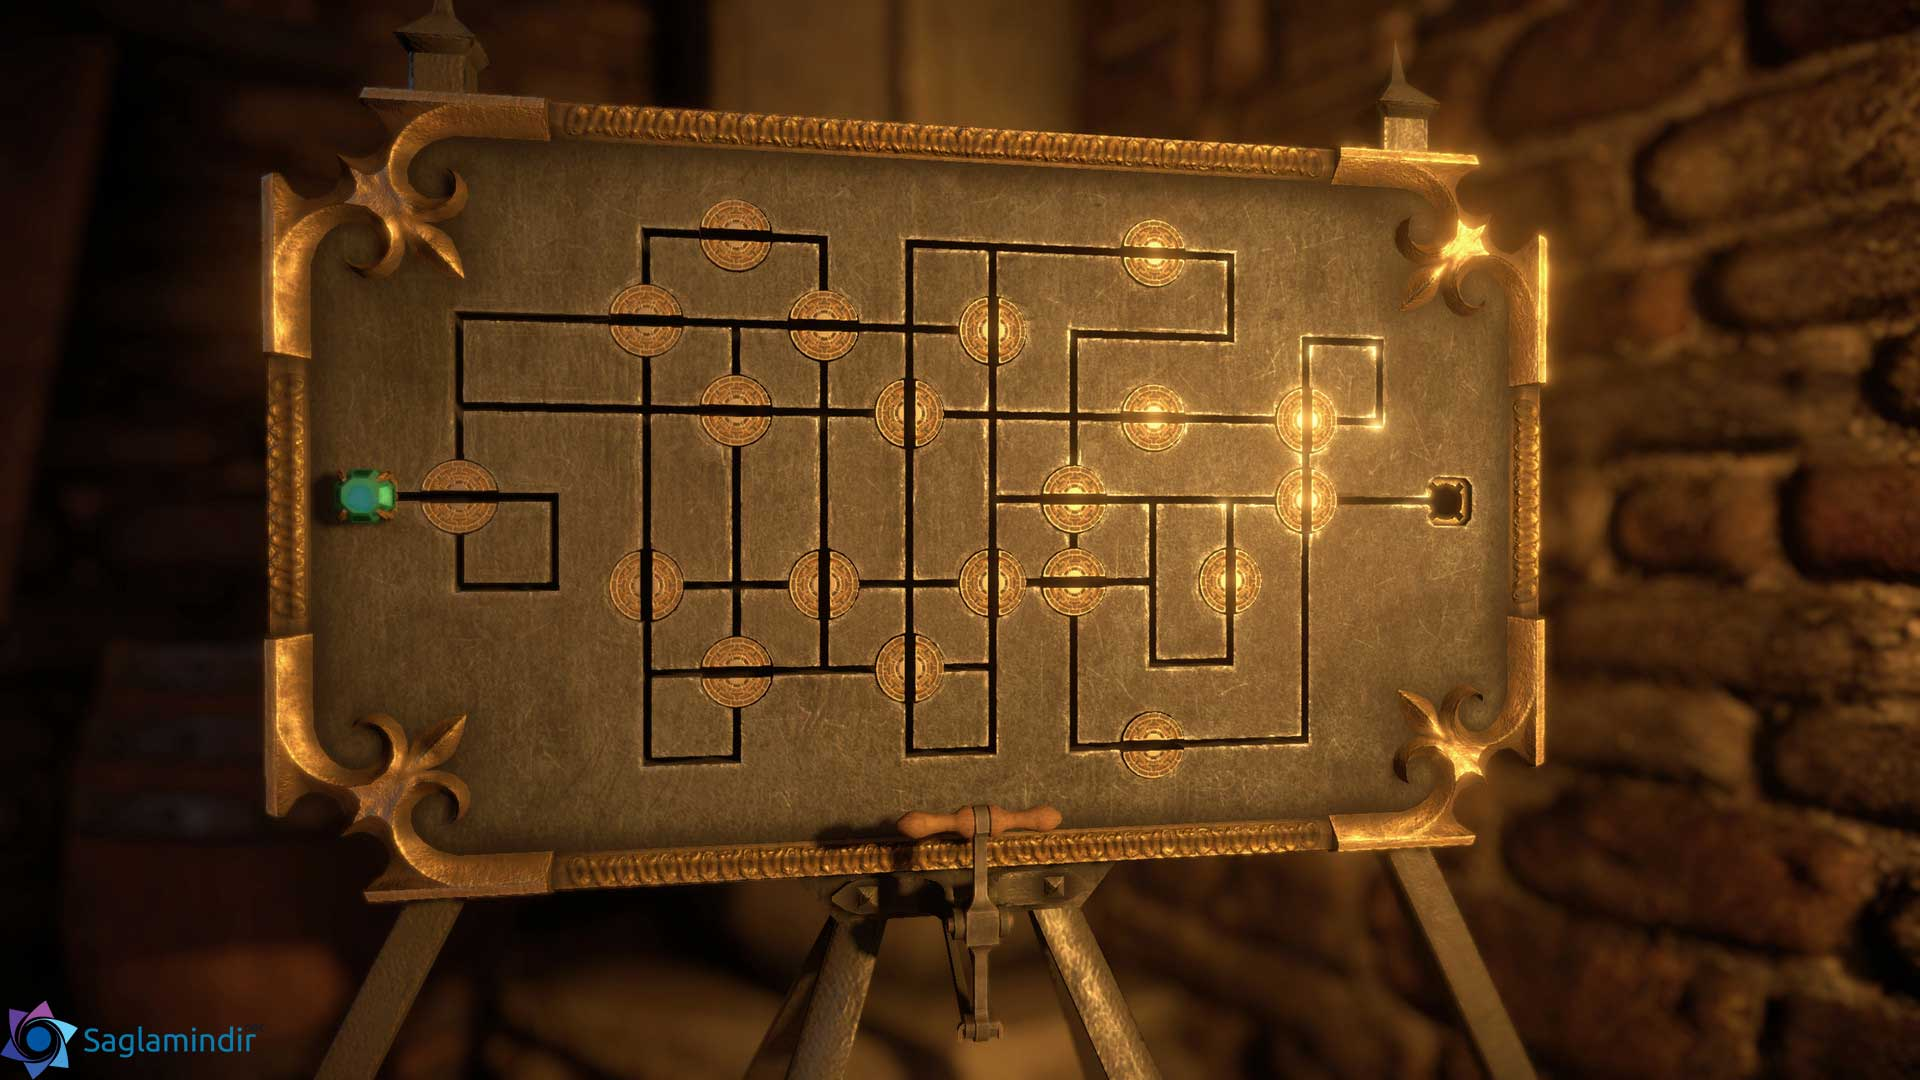 The House of Da Vinci torrent indir